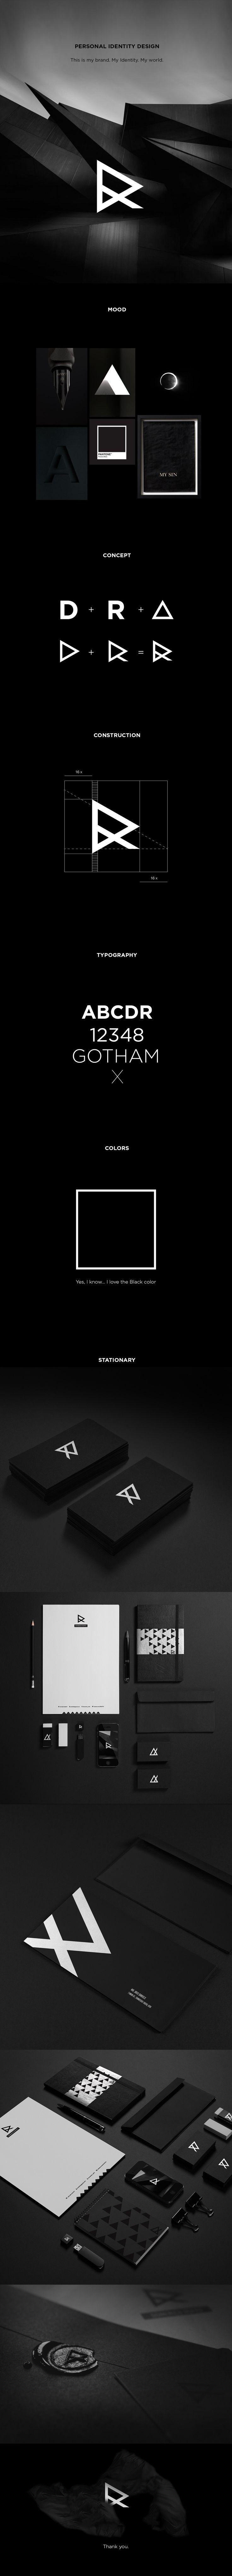 Personal Identity Design Studio of logo design and corporate id.Mokup:http://goo.gl/2Xm5P